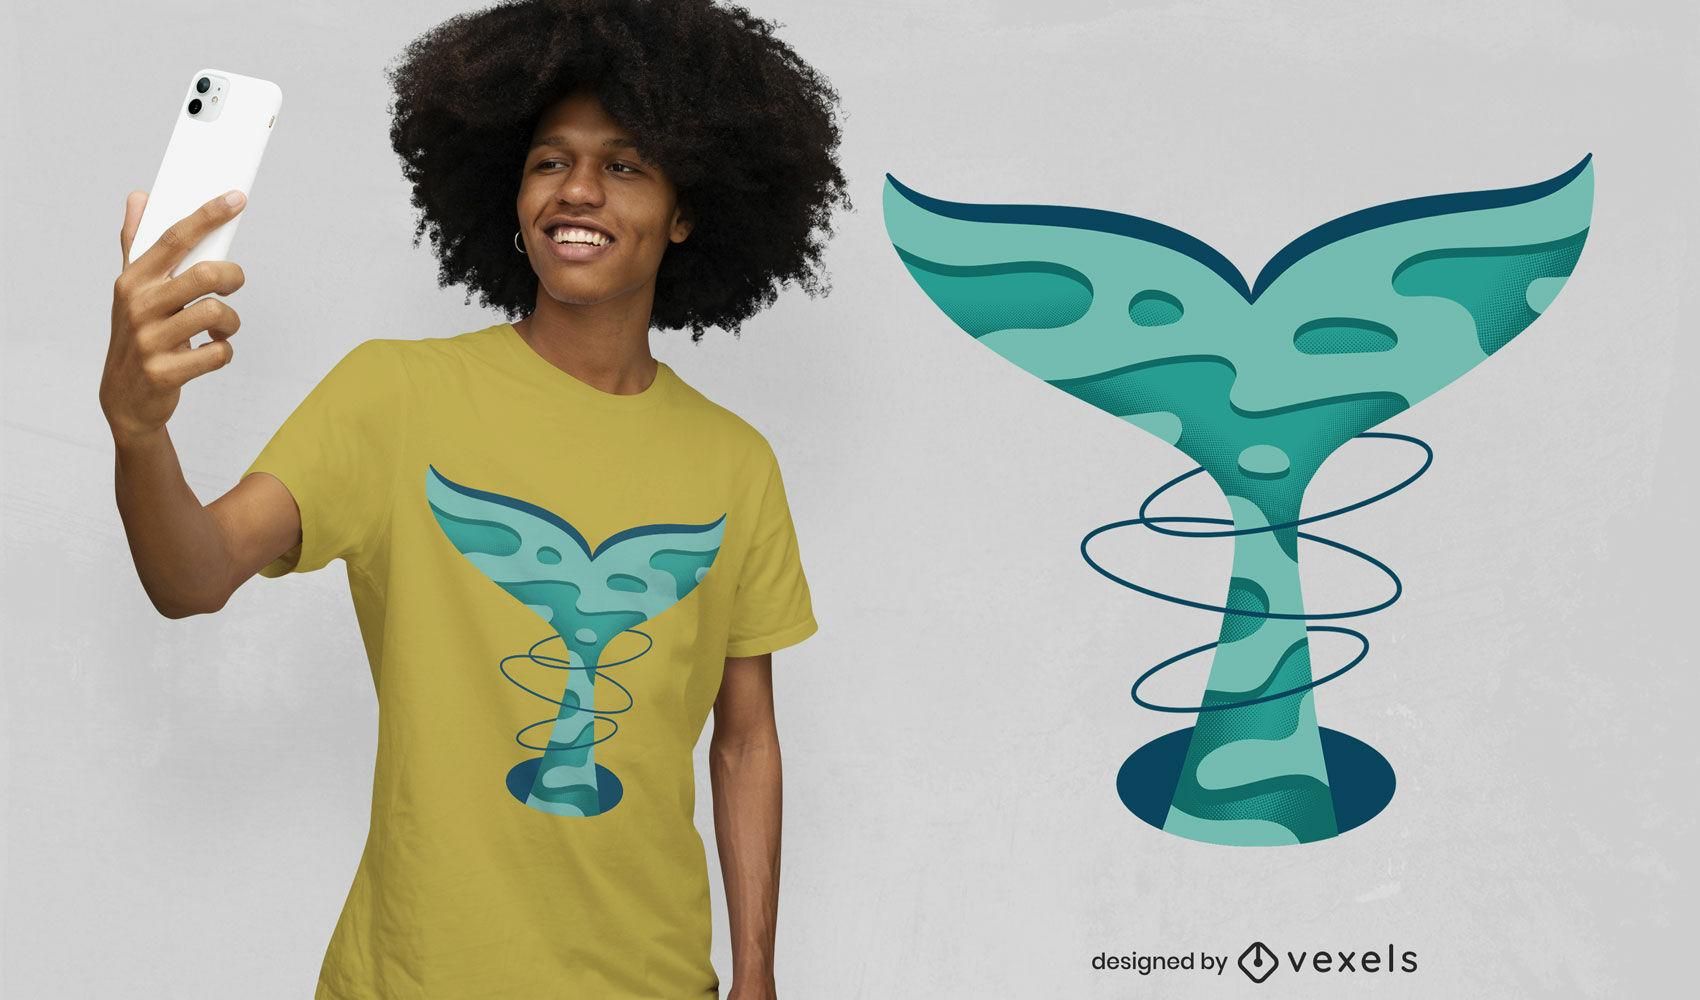 Whale tail papercut t-shirt design